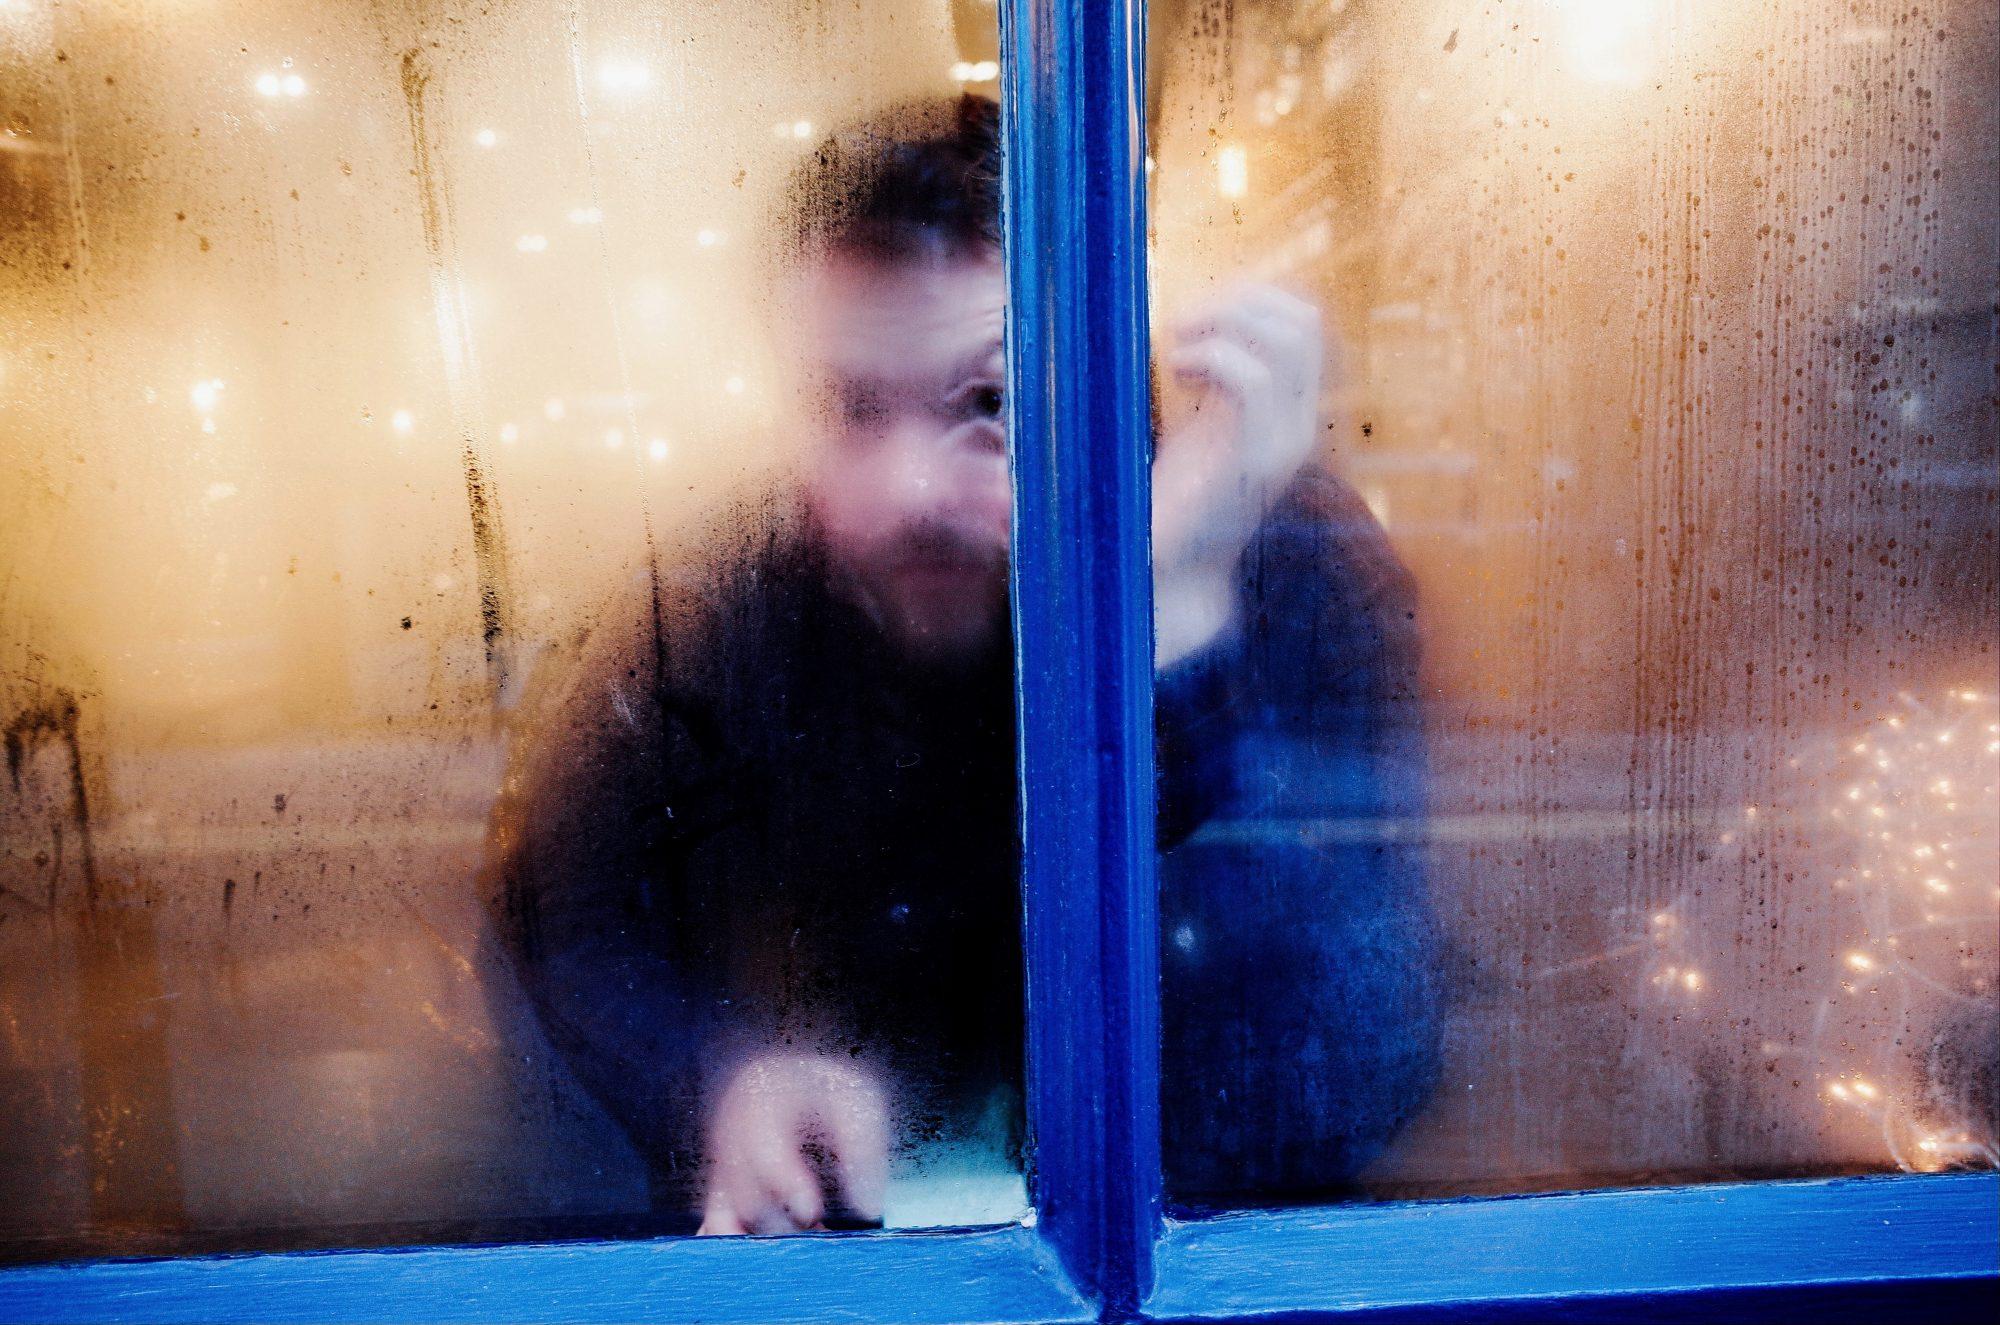 Man with eye looking through foggy window. London, 2018